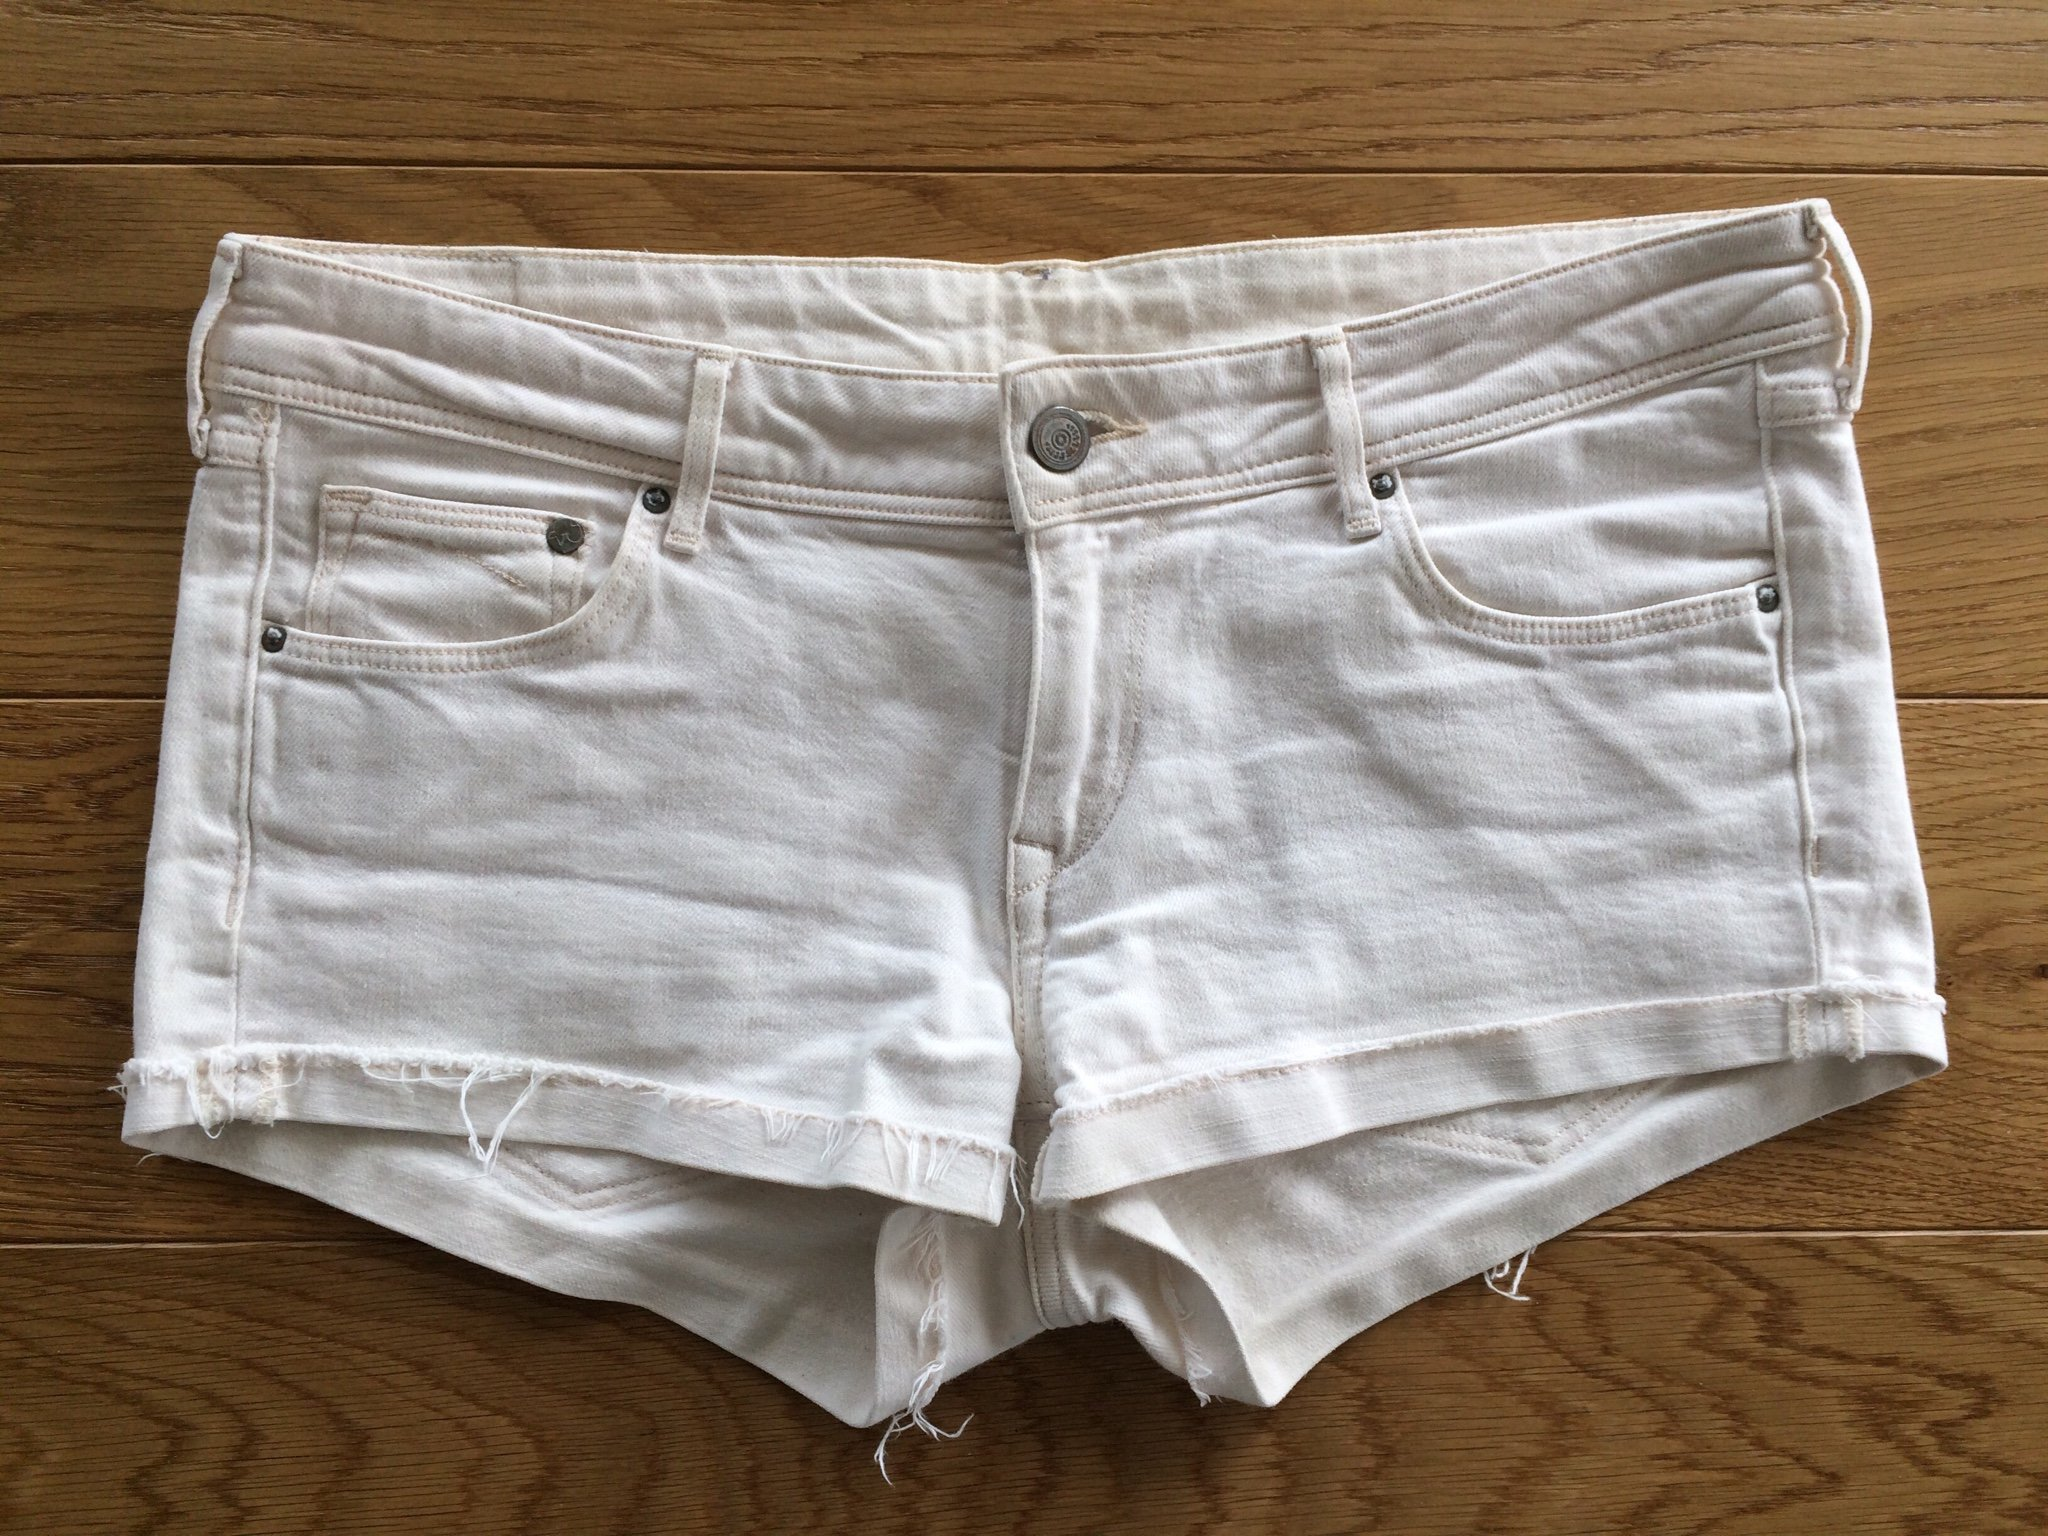 elegant online till salu enormt lager Snygga shorts kortbyxor vita denim HM dam tjej .. (380746004) ᐈ ...